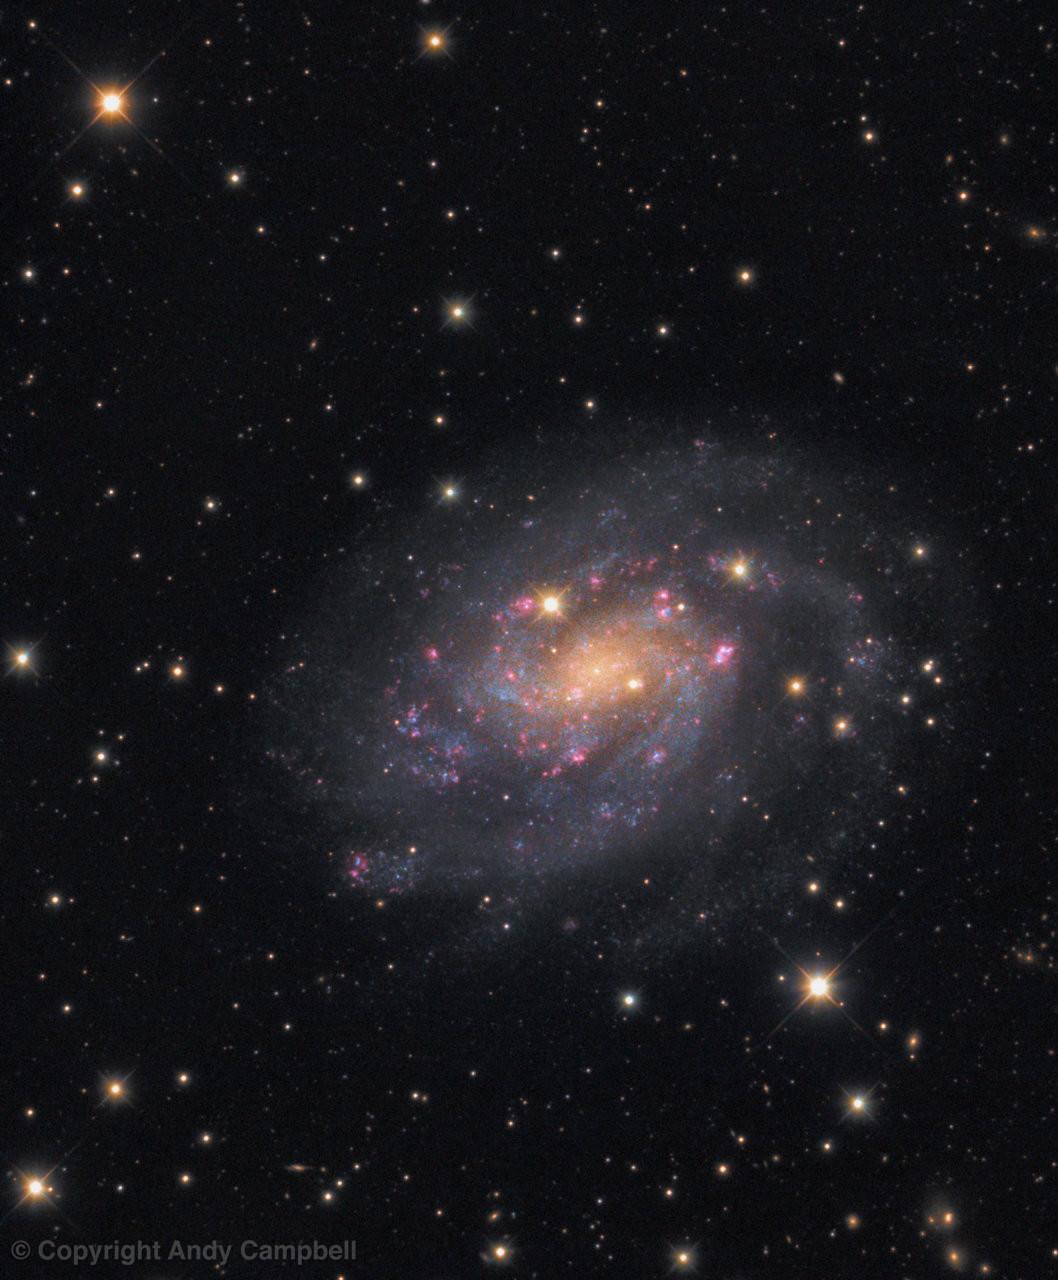 NGC 300 Galaxy in Sculptor